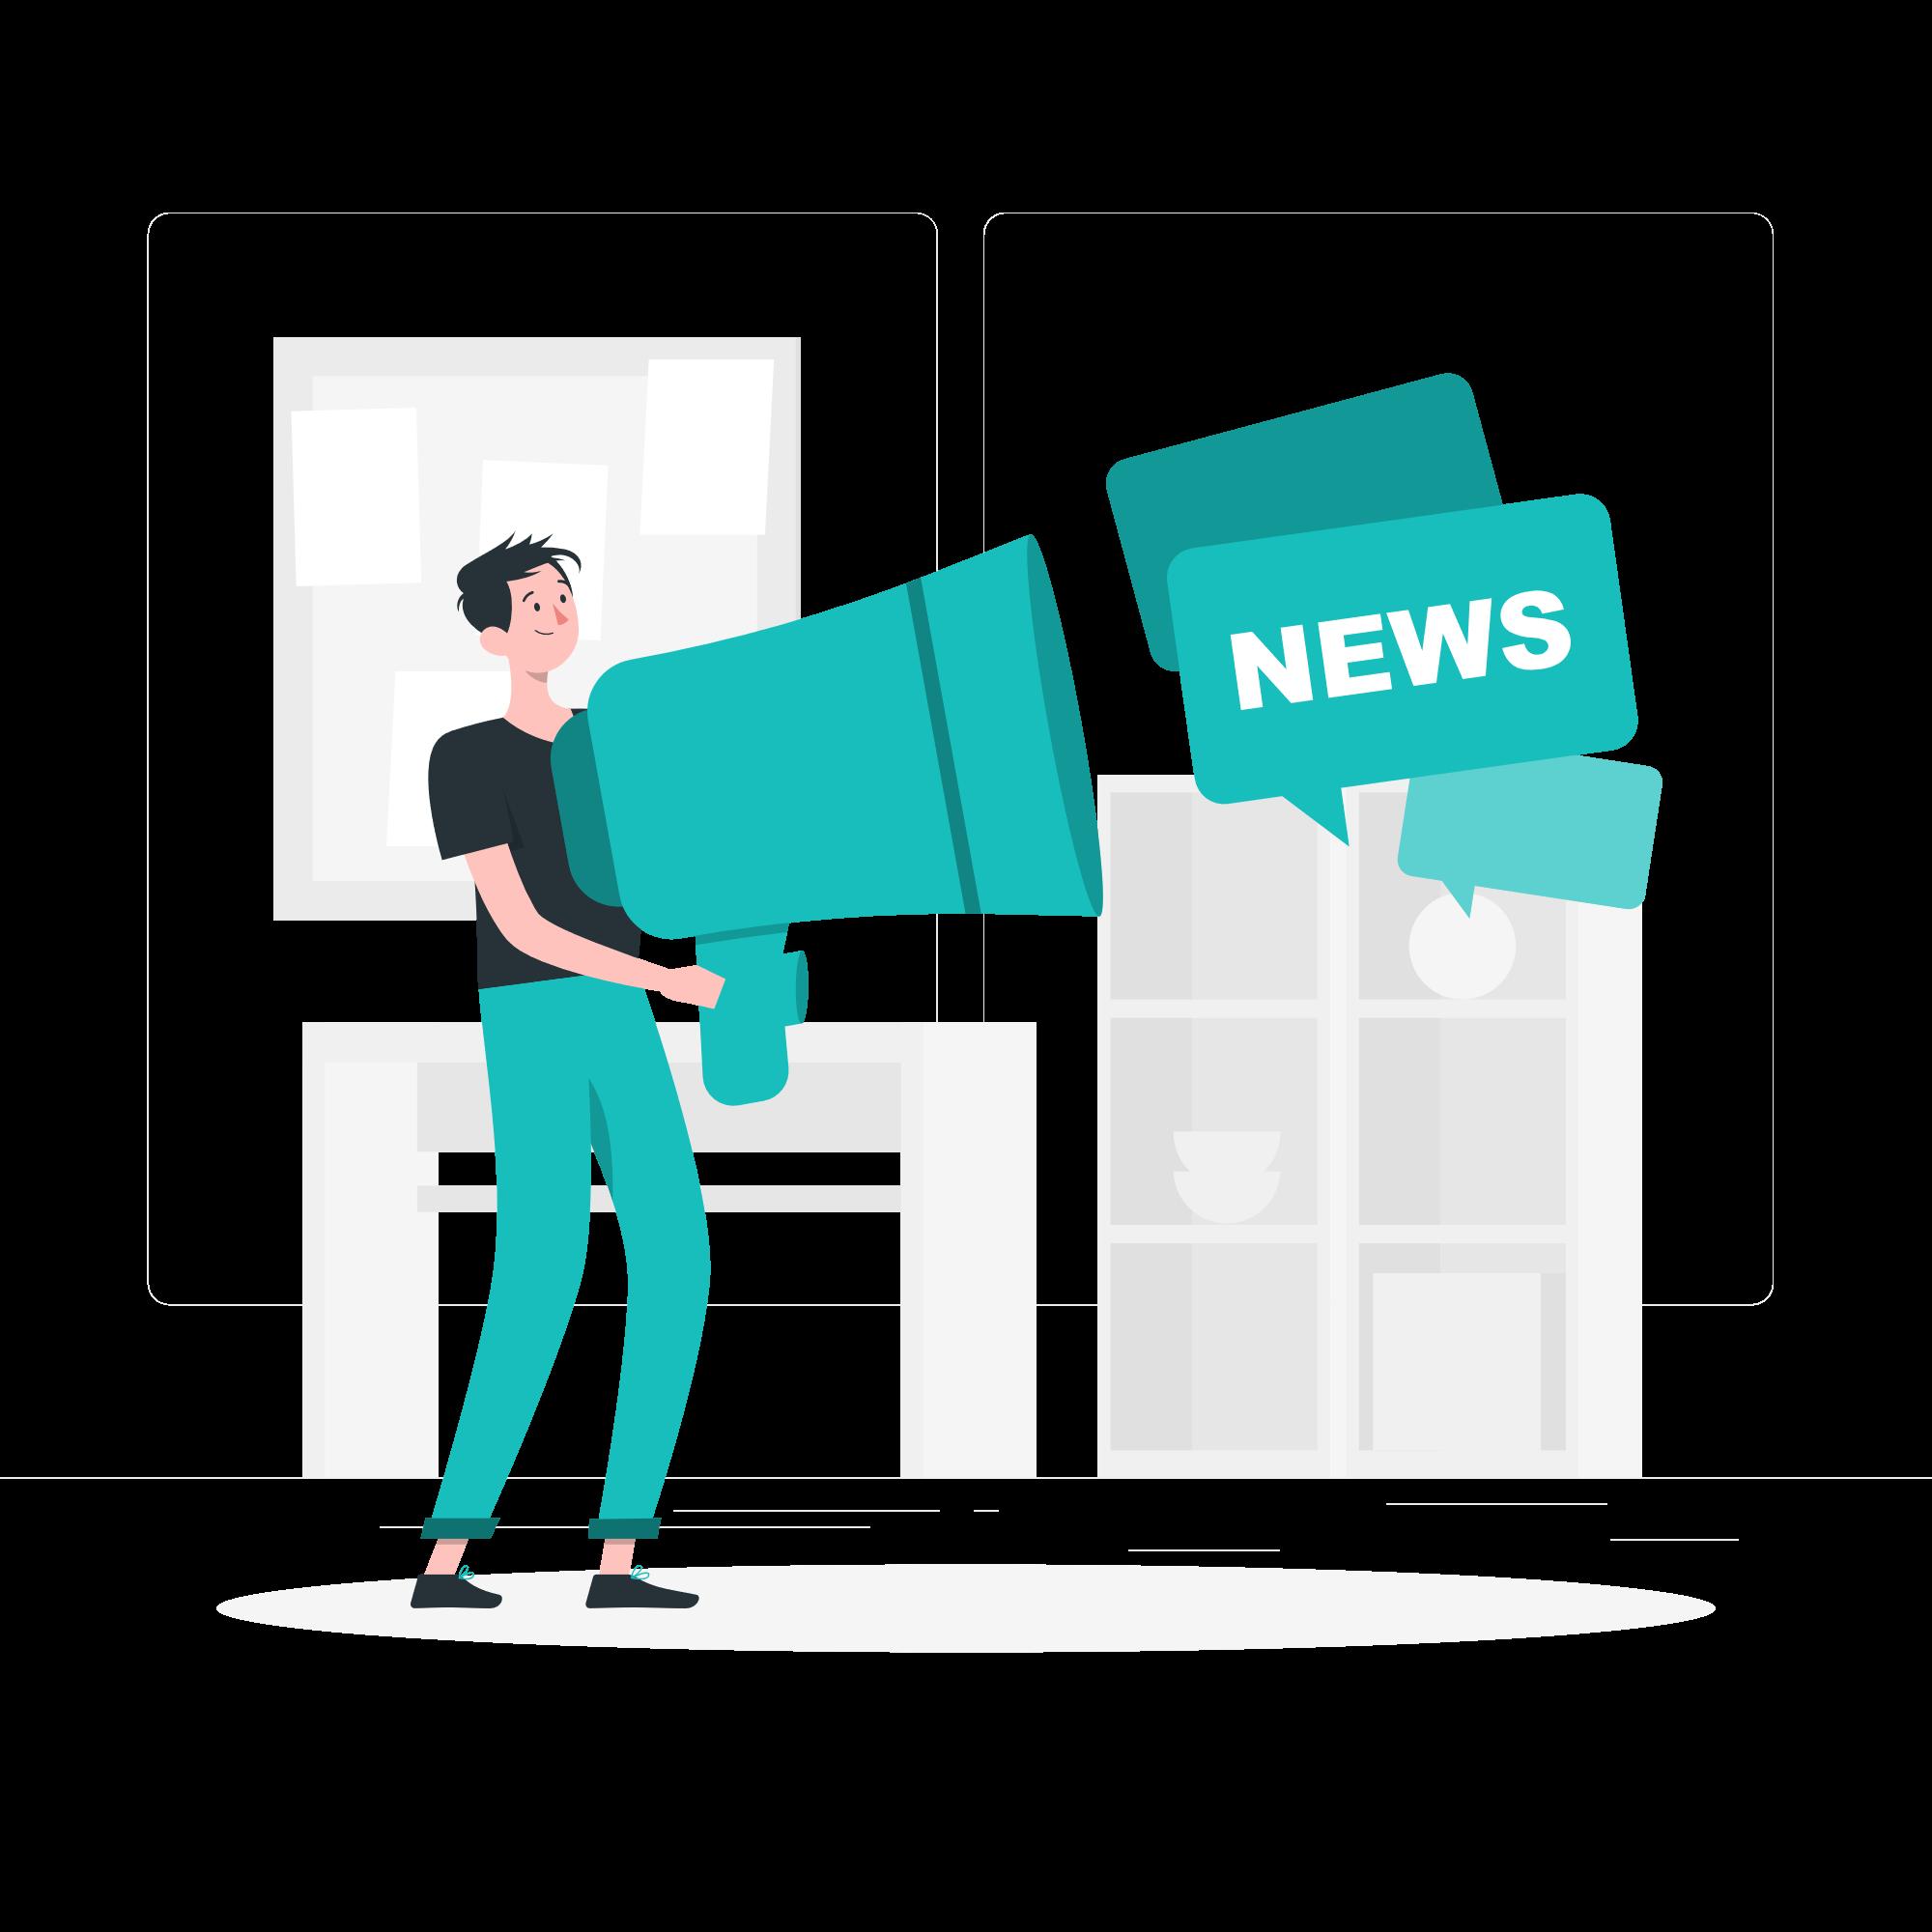 nieuws-cw-design